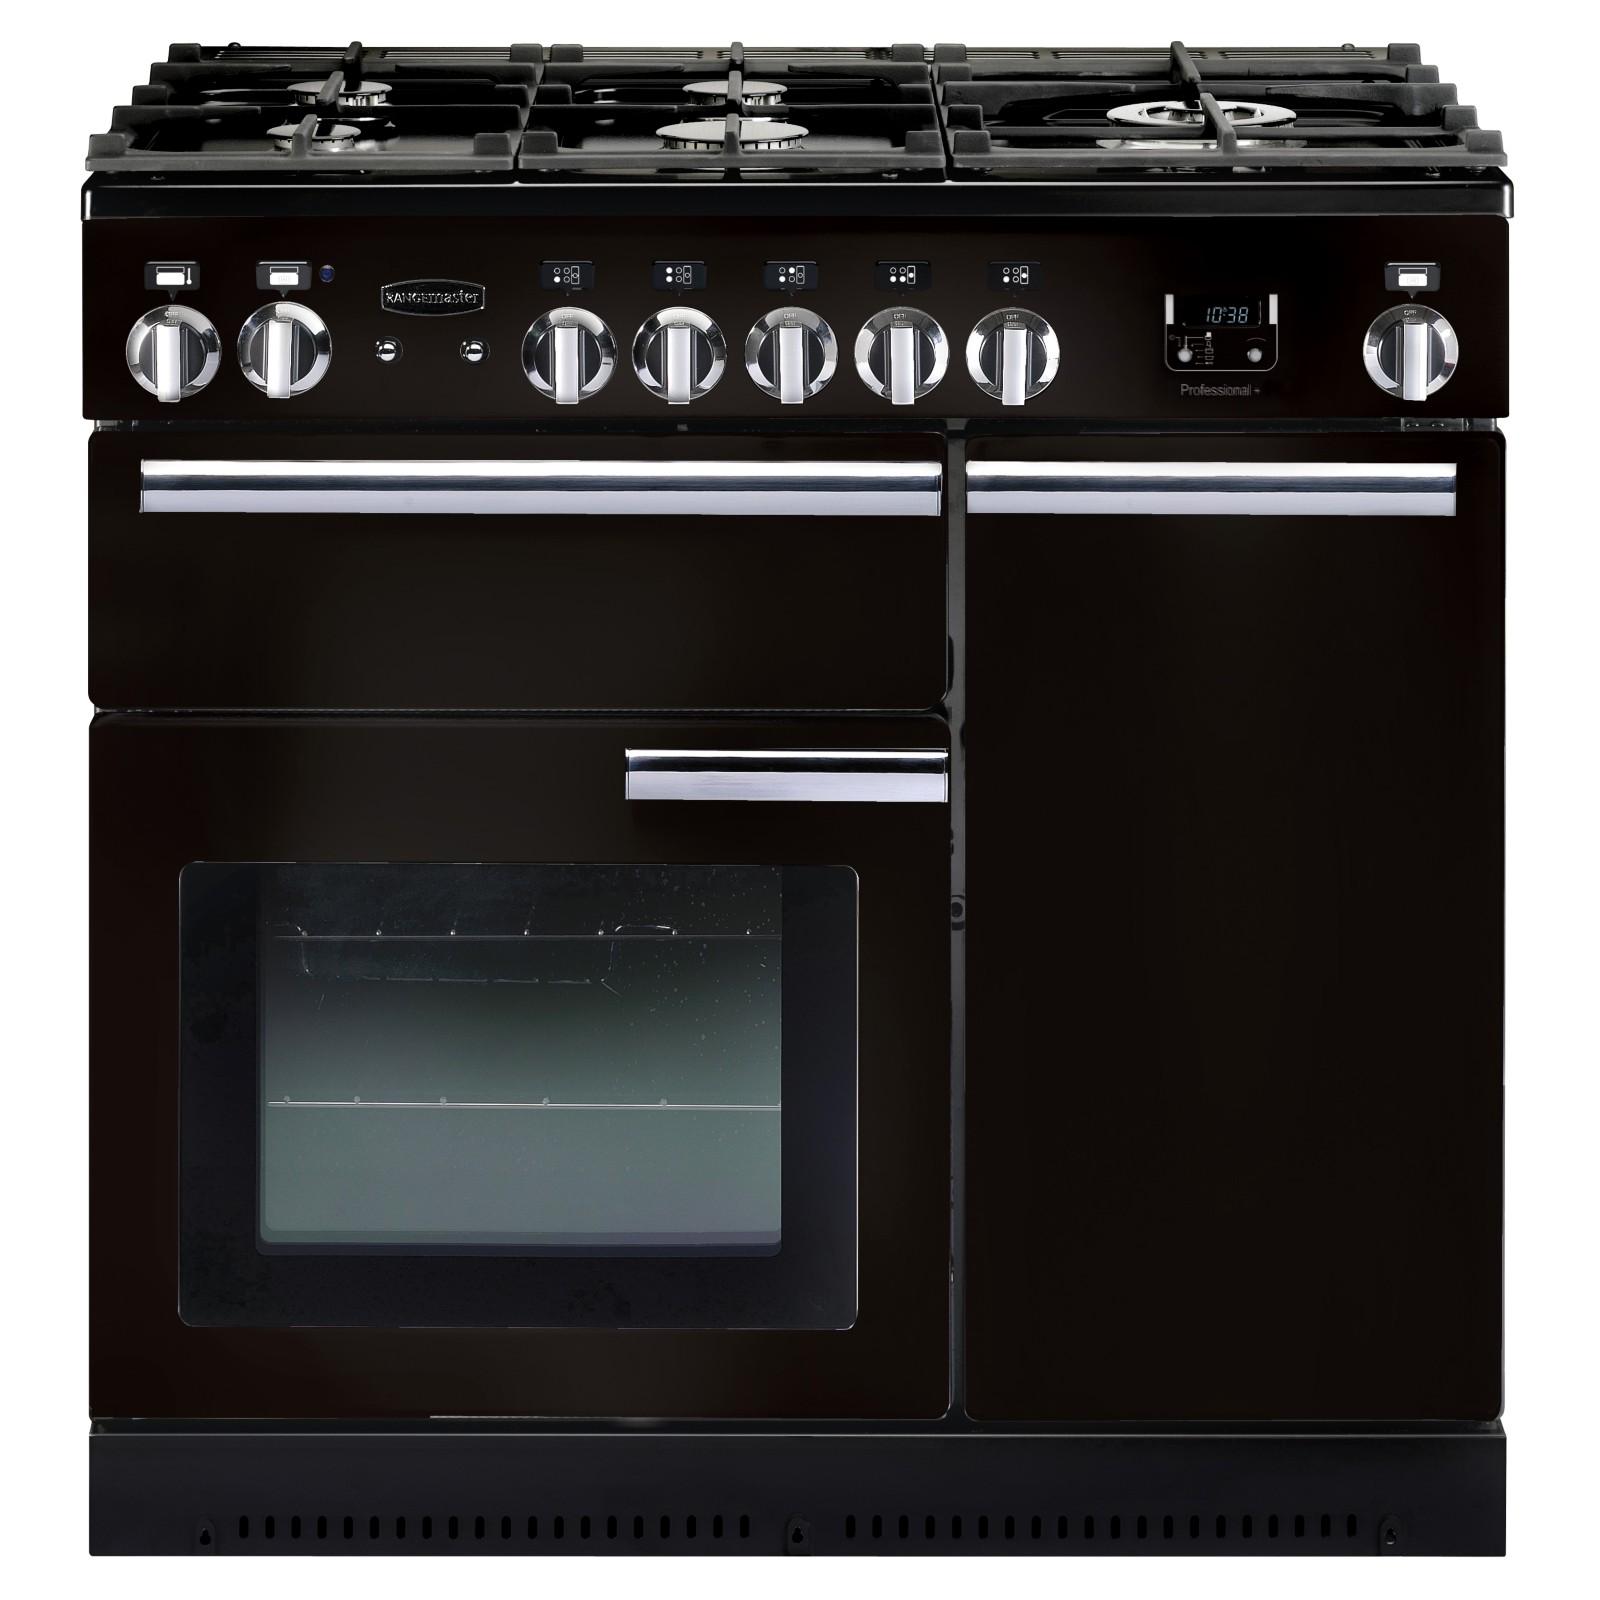 Rangemaster Professional+ 90 Dual Fuel Range Cooker Gloss Black